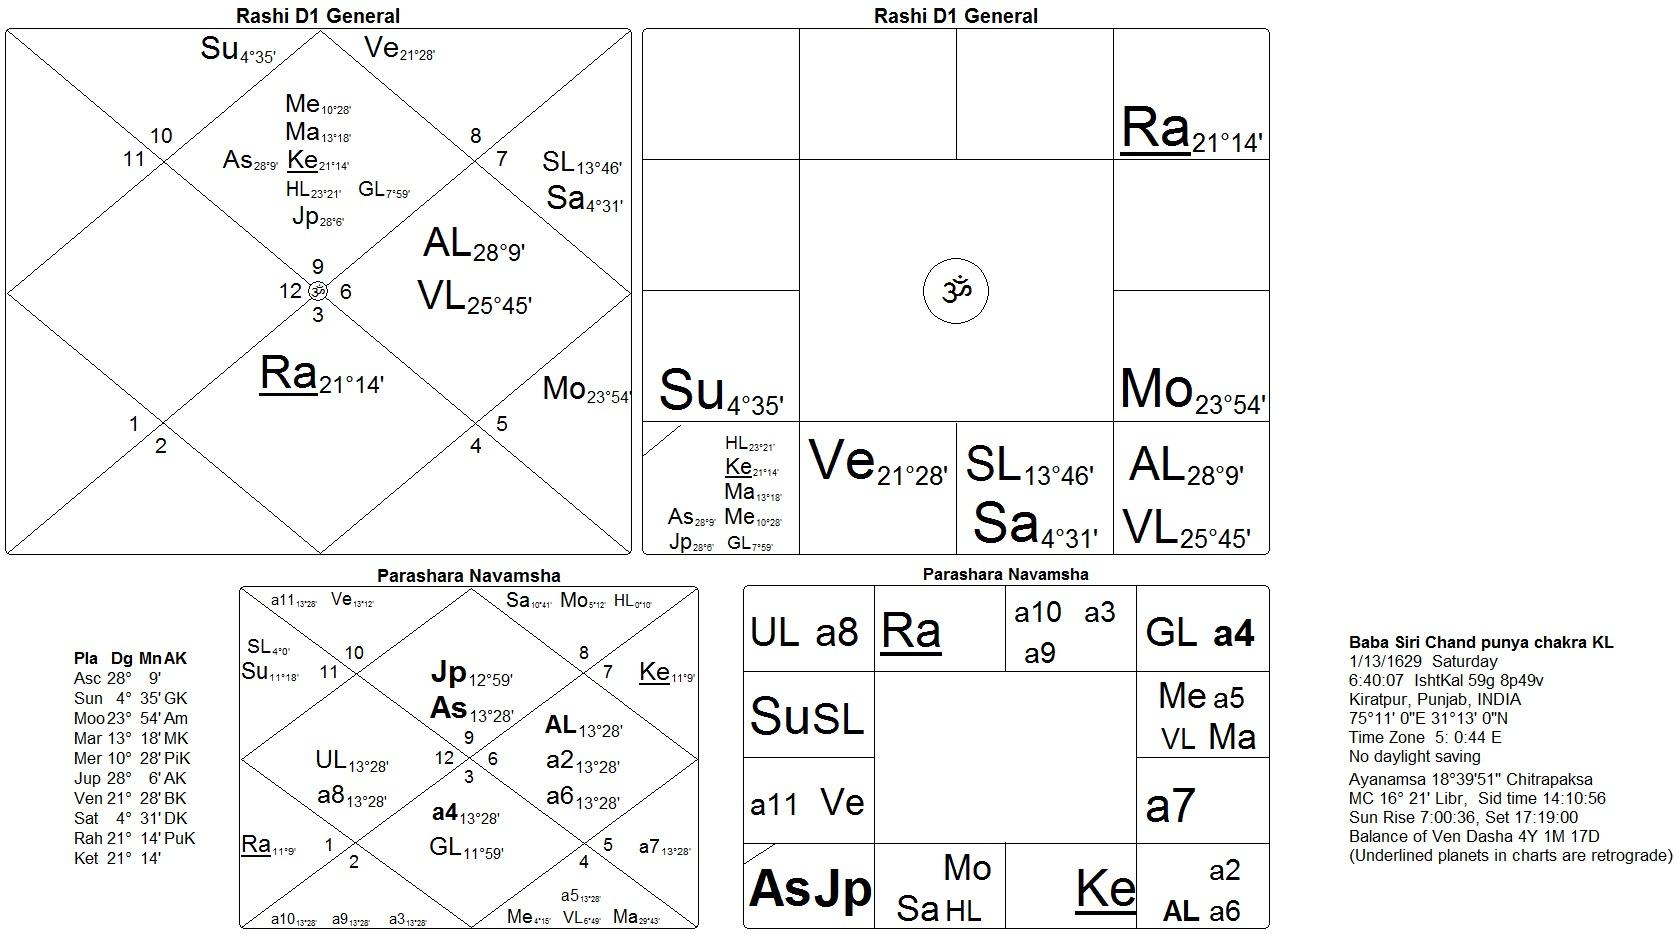 Horoscope of baba siri chand son of guru nanak dev sat siri khalsa horoscope baba siri chand punya chakra nvjuhfo Images